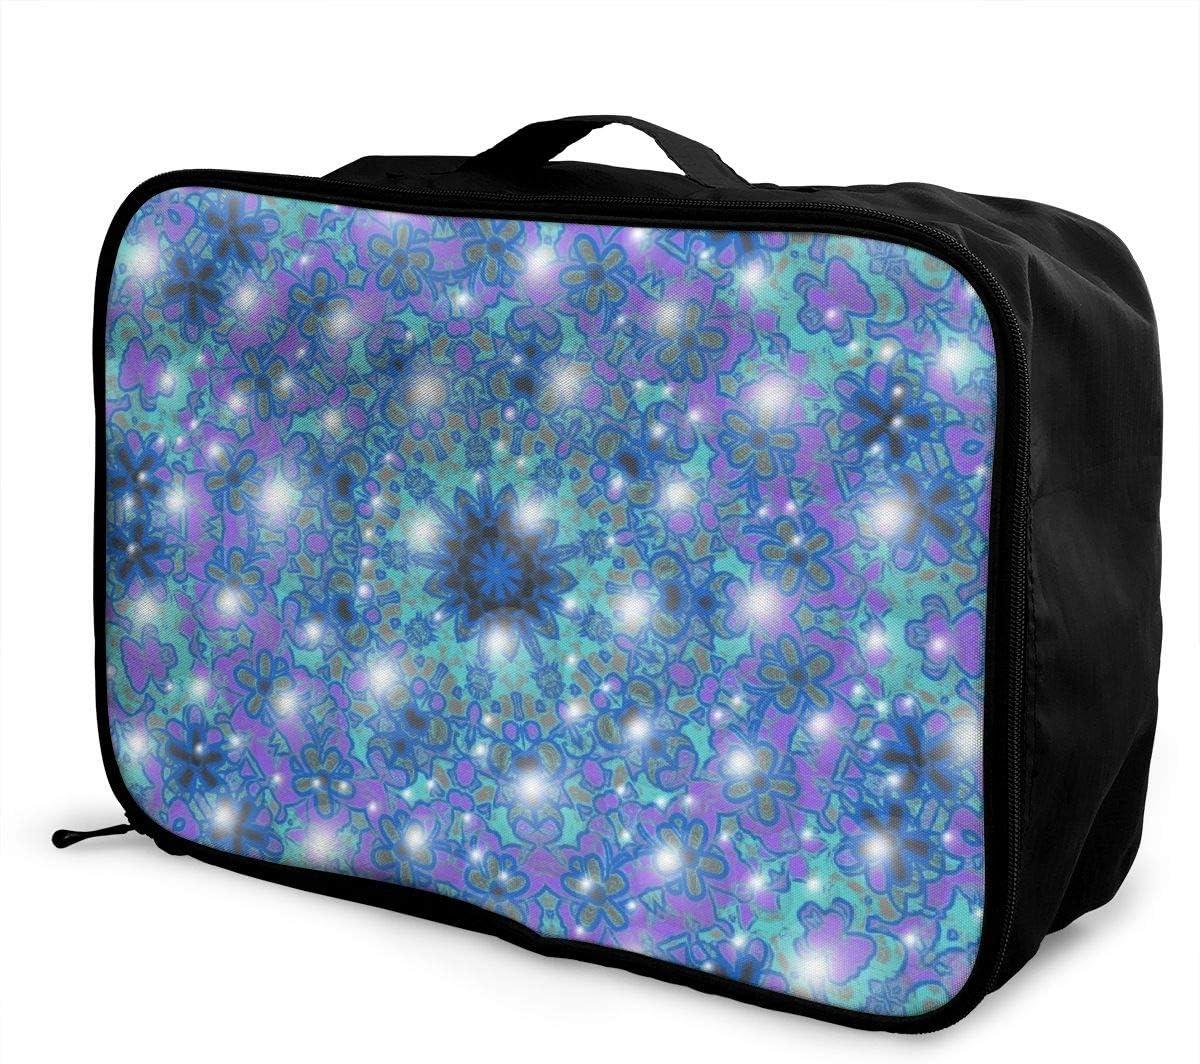 Yunshm Galaxy Kaleidoscope Warp Personalized Trolley Handbag Waterproof Unisex Large Capacity For Business Travel Storage